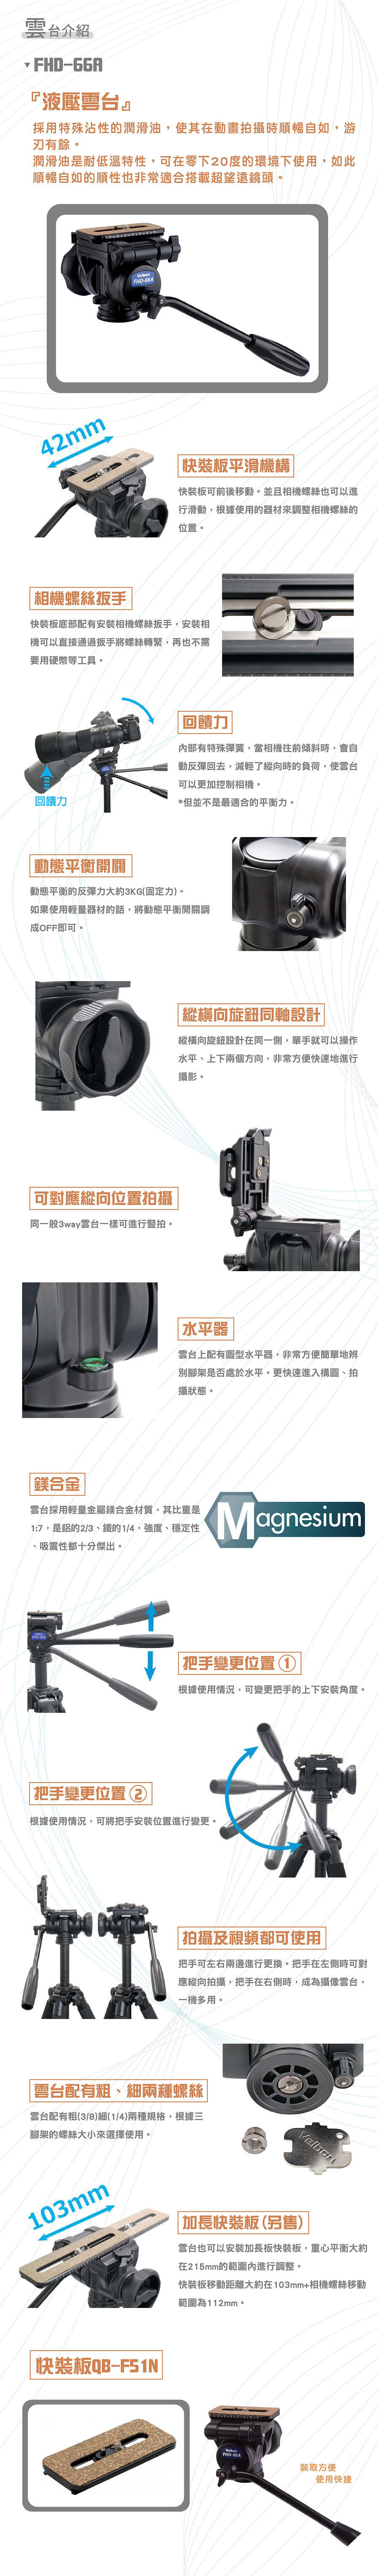 HEAD雲台-攝影FHD-03.jpg